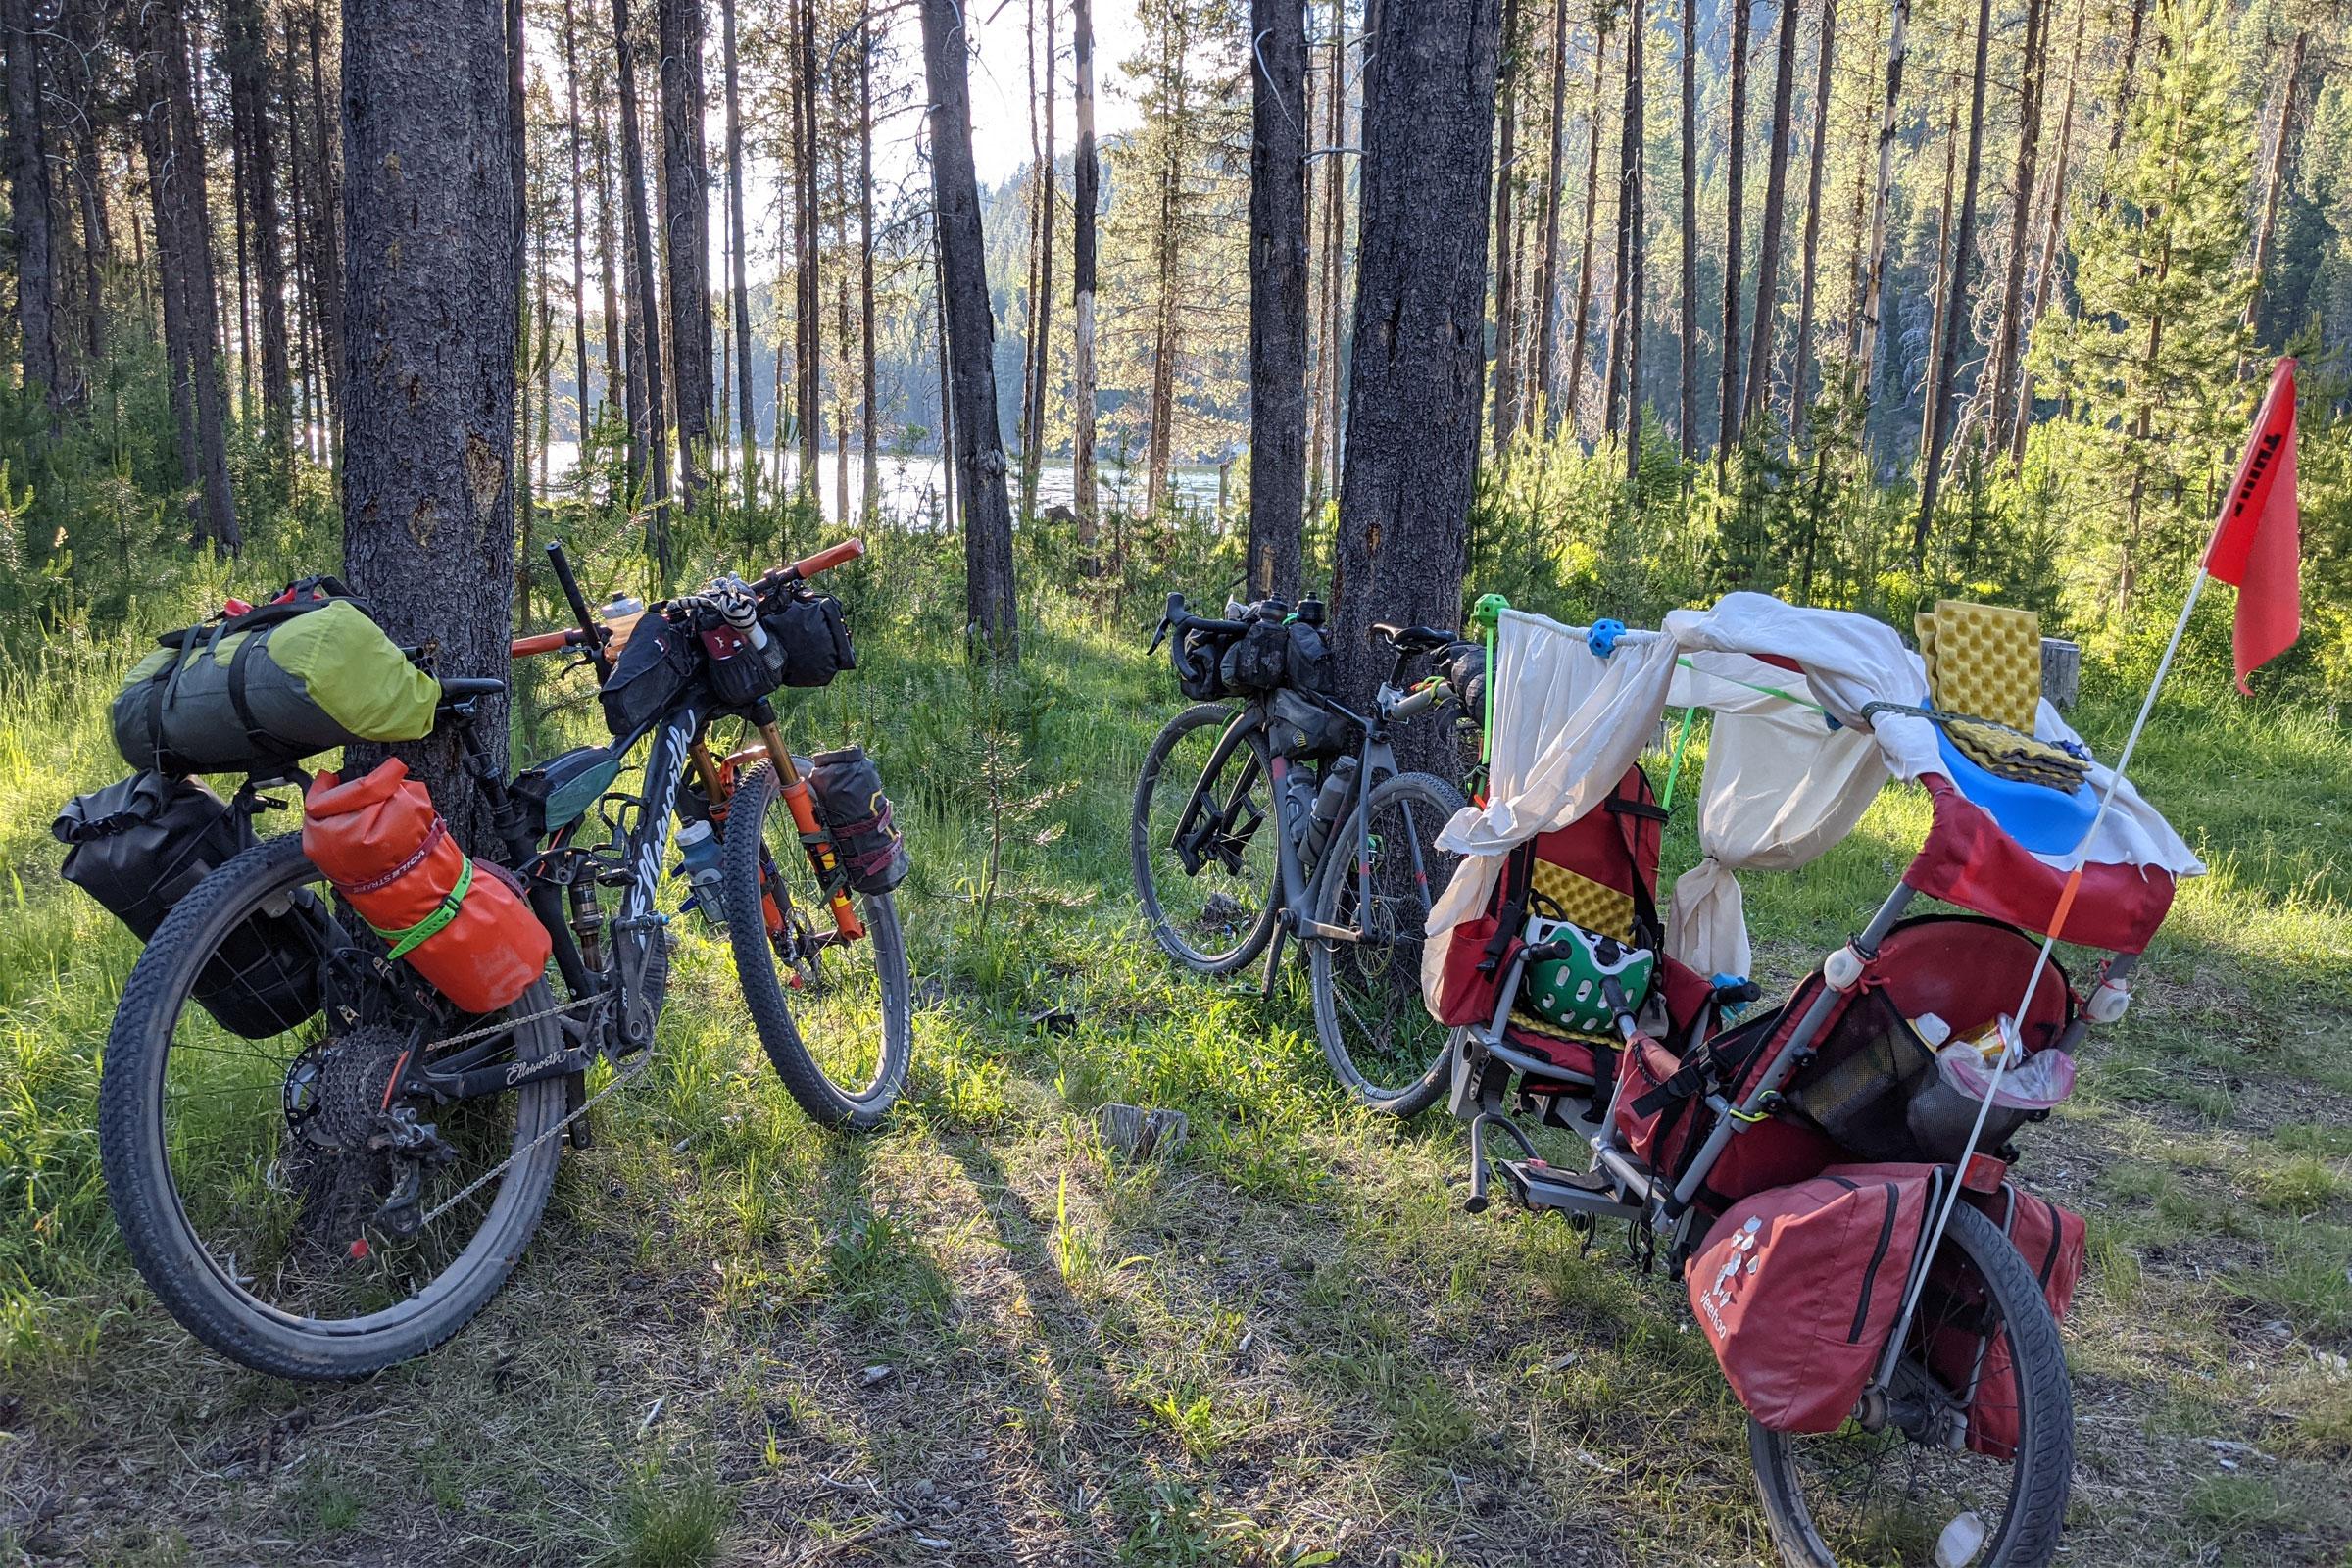 aeroe spider bike rack - gearing up